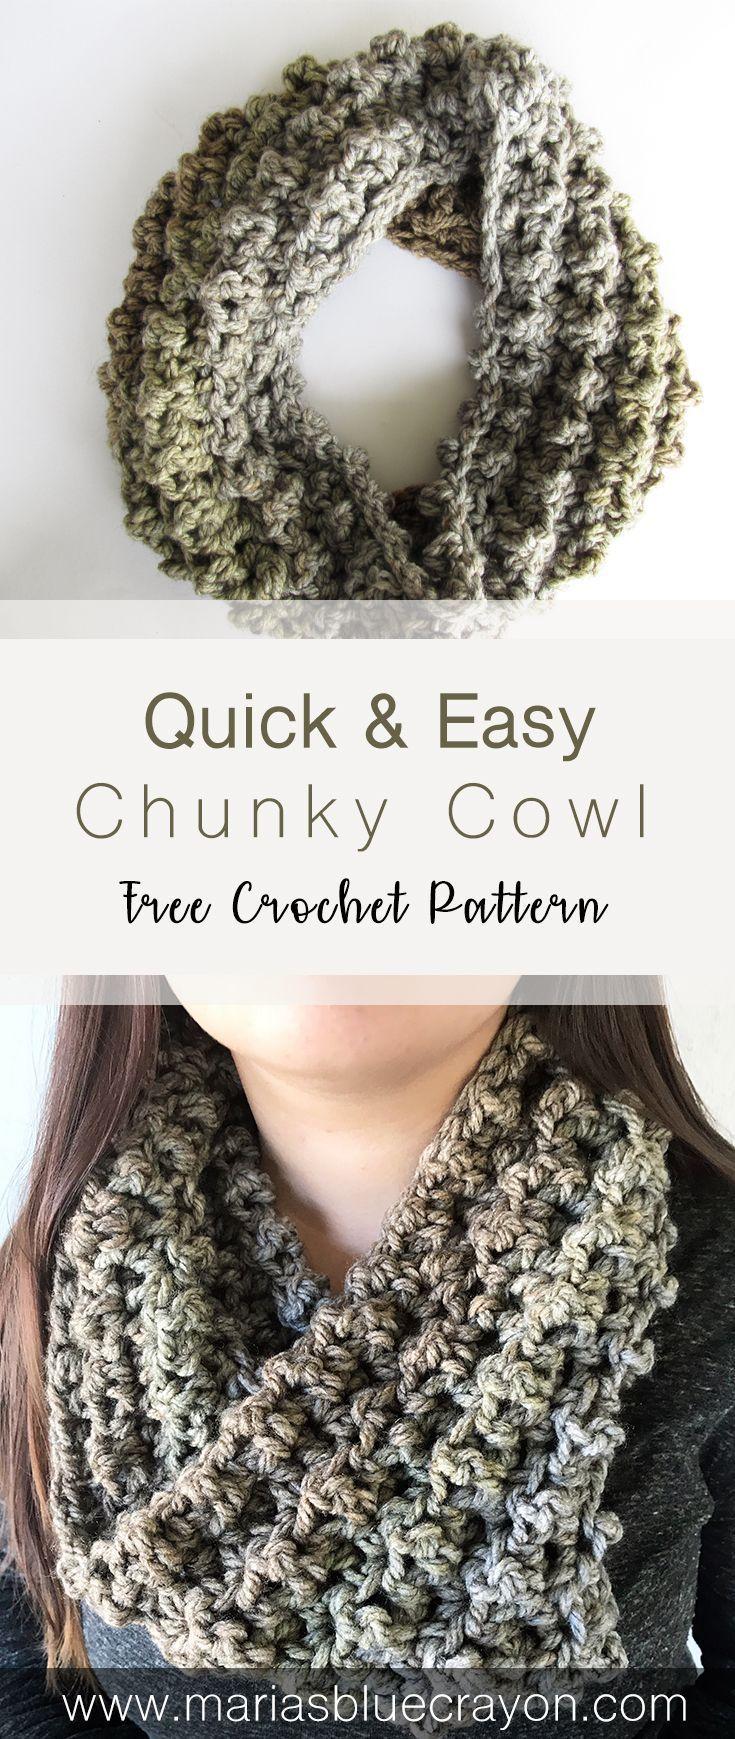 Quick & Easy Chunky Cowl Crochet Pattern | Crochet/ Knitting ...